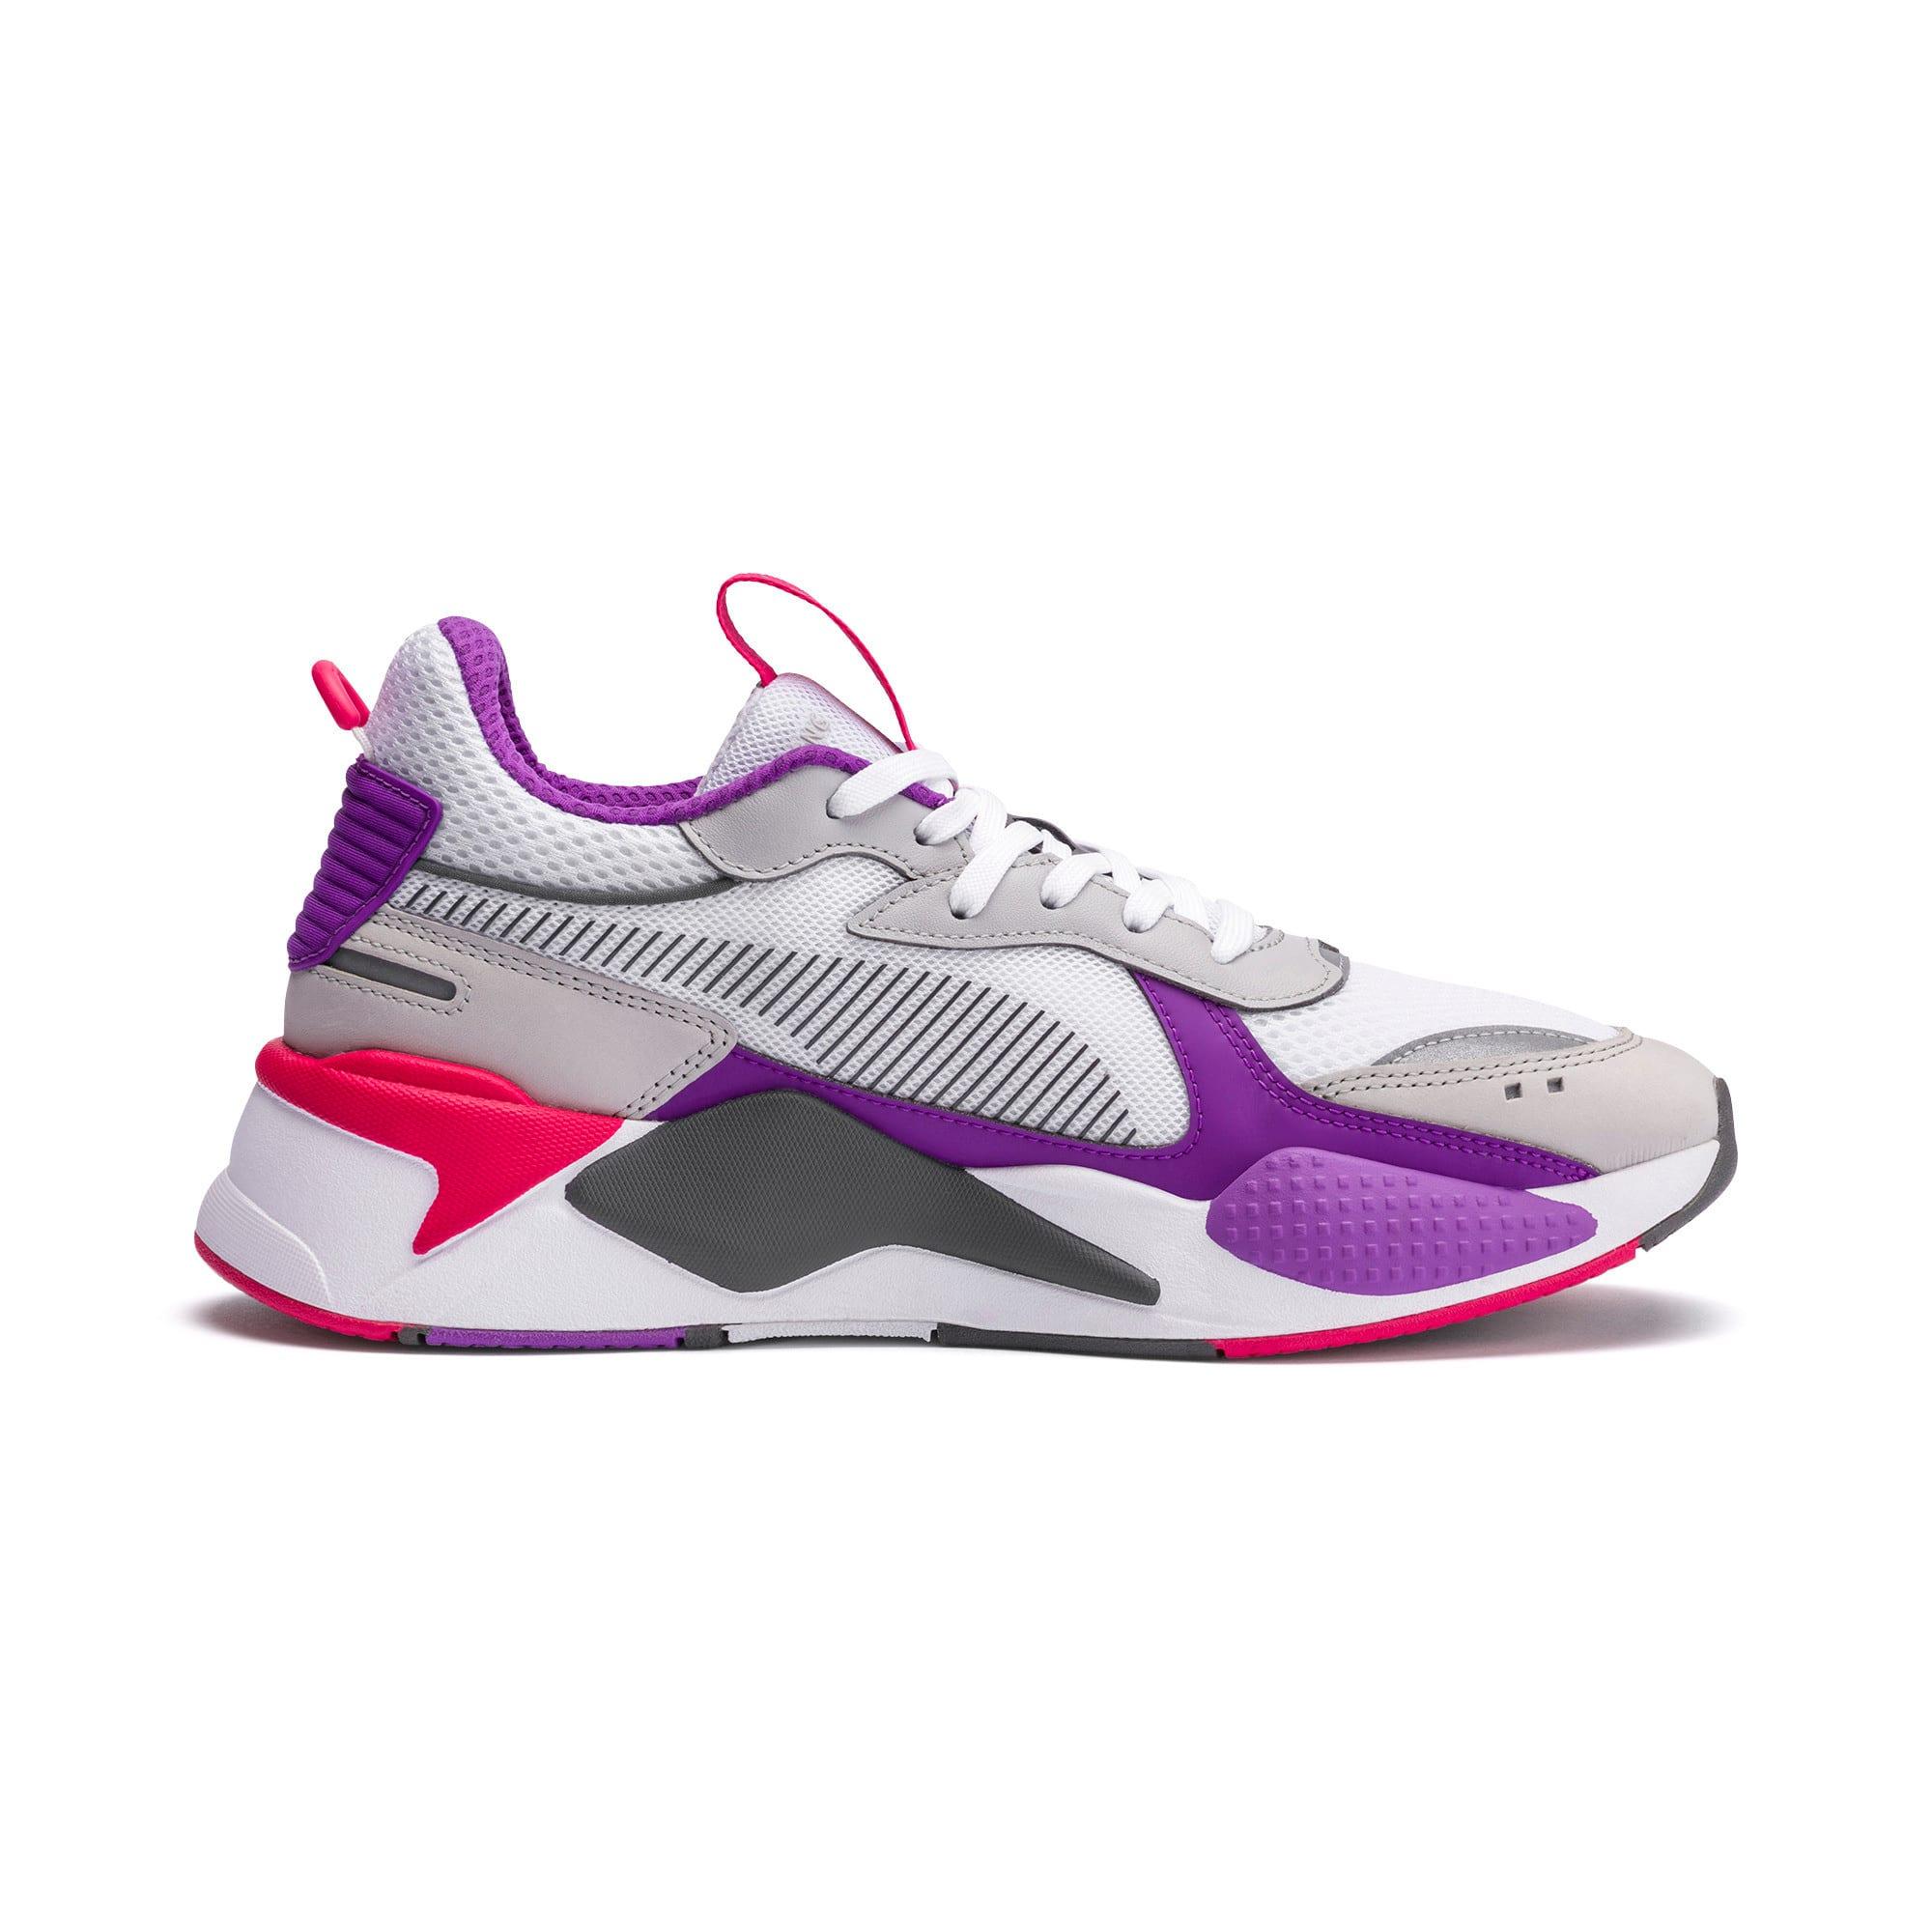 Thumbnail 5 of RS-X Bold Sneaker, PWhite-High Rise-Royal Lilac, medium